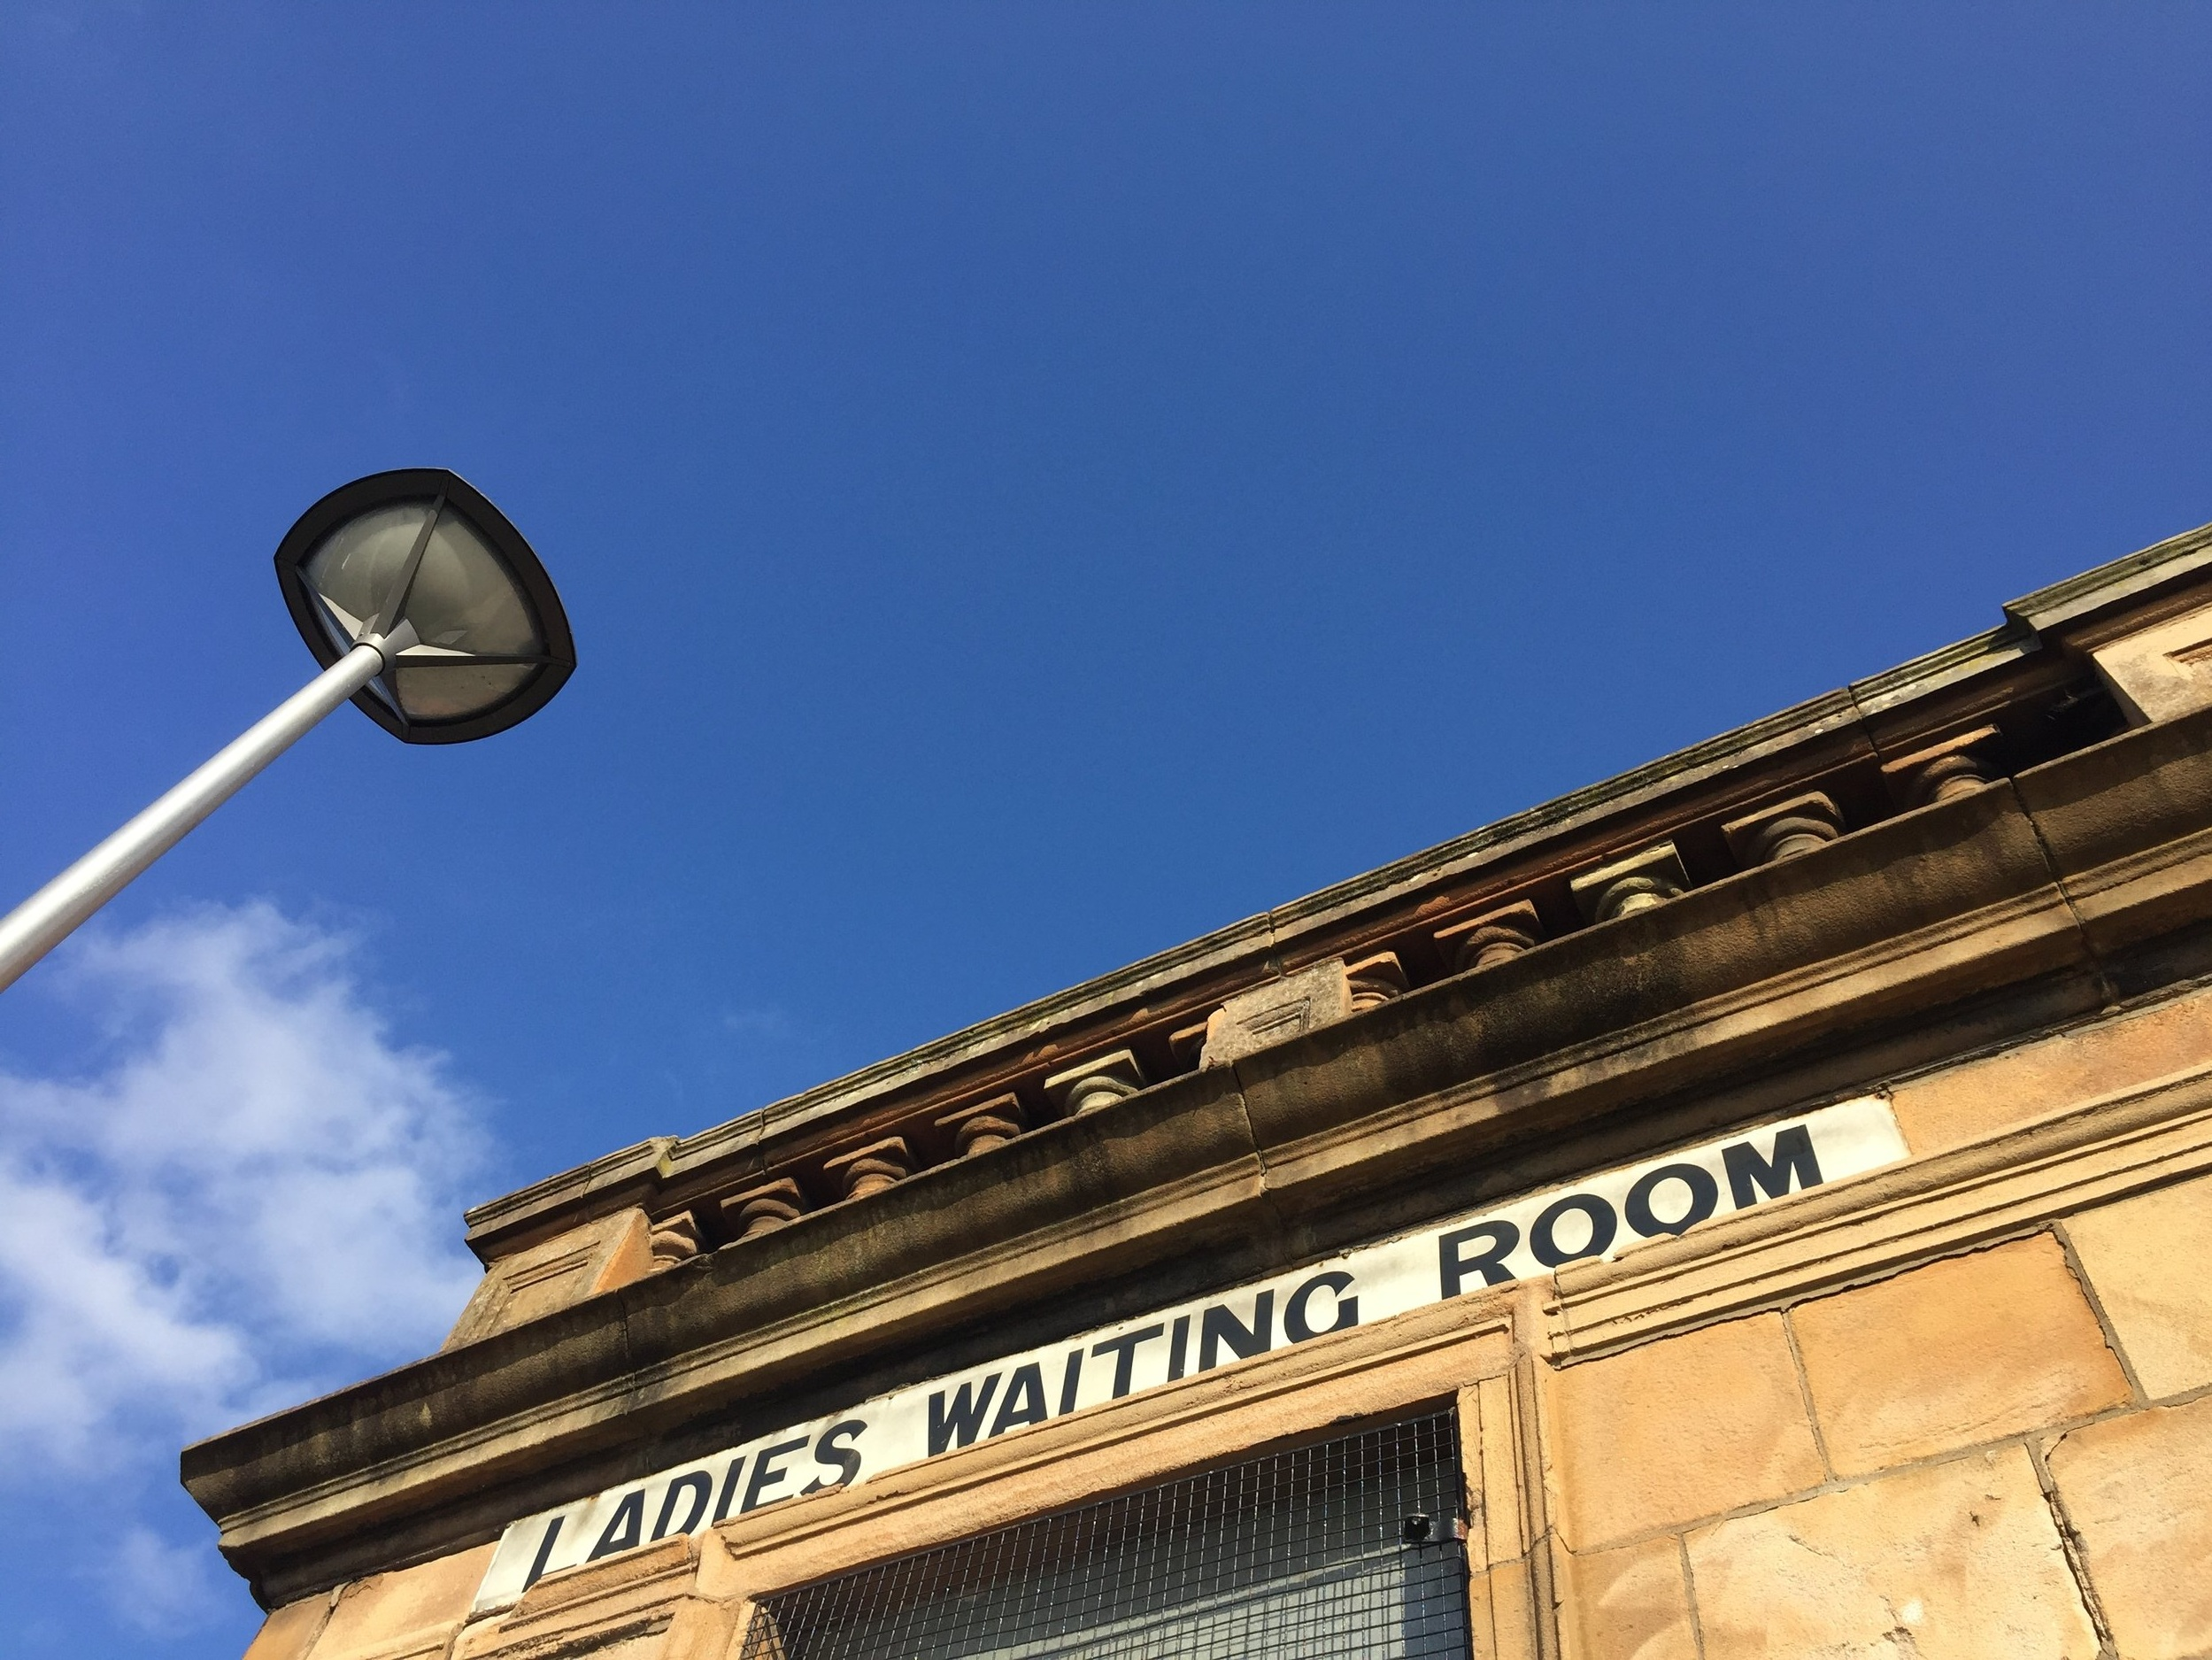 The Ladies Waiting Room -